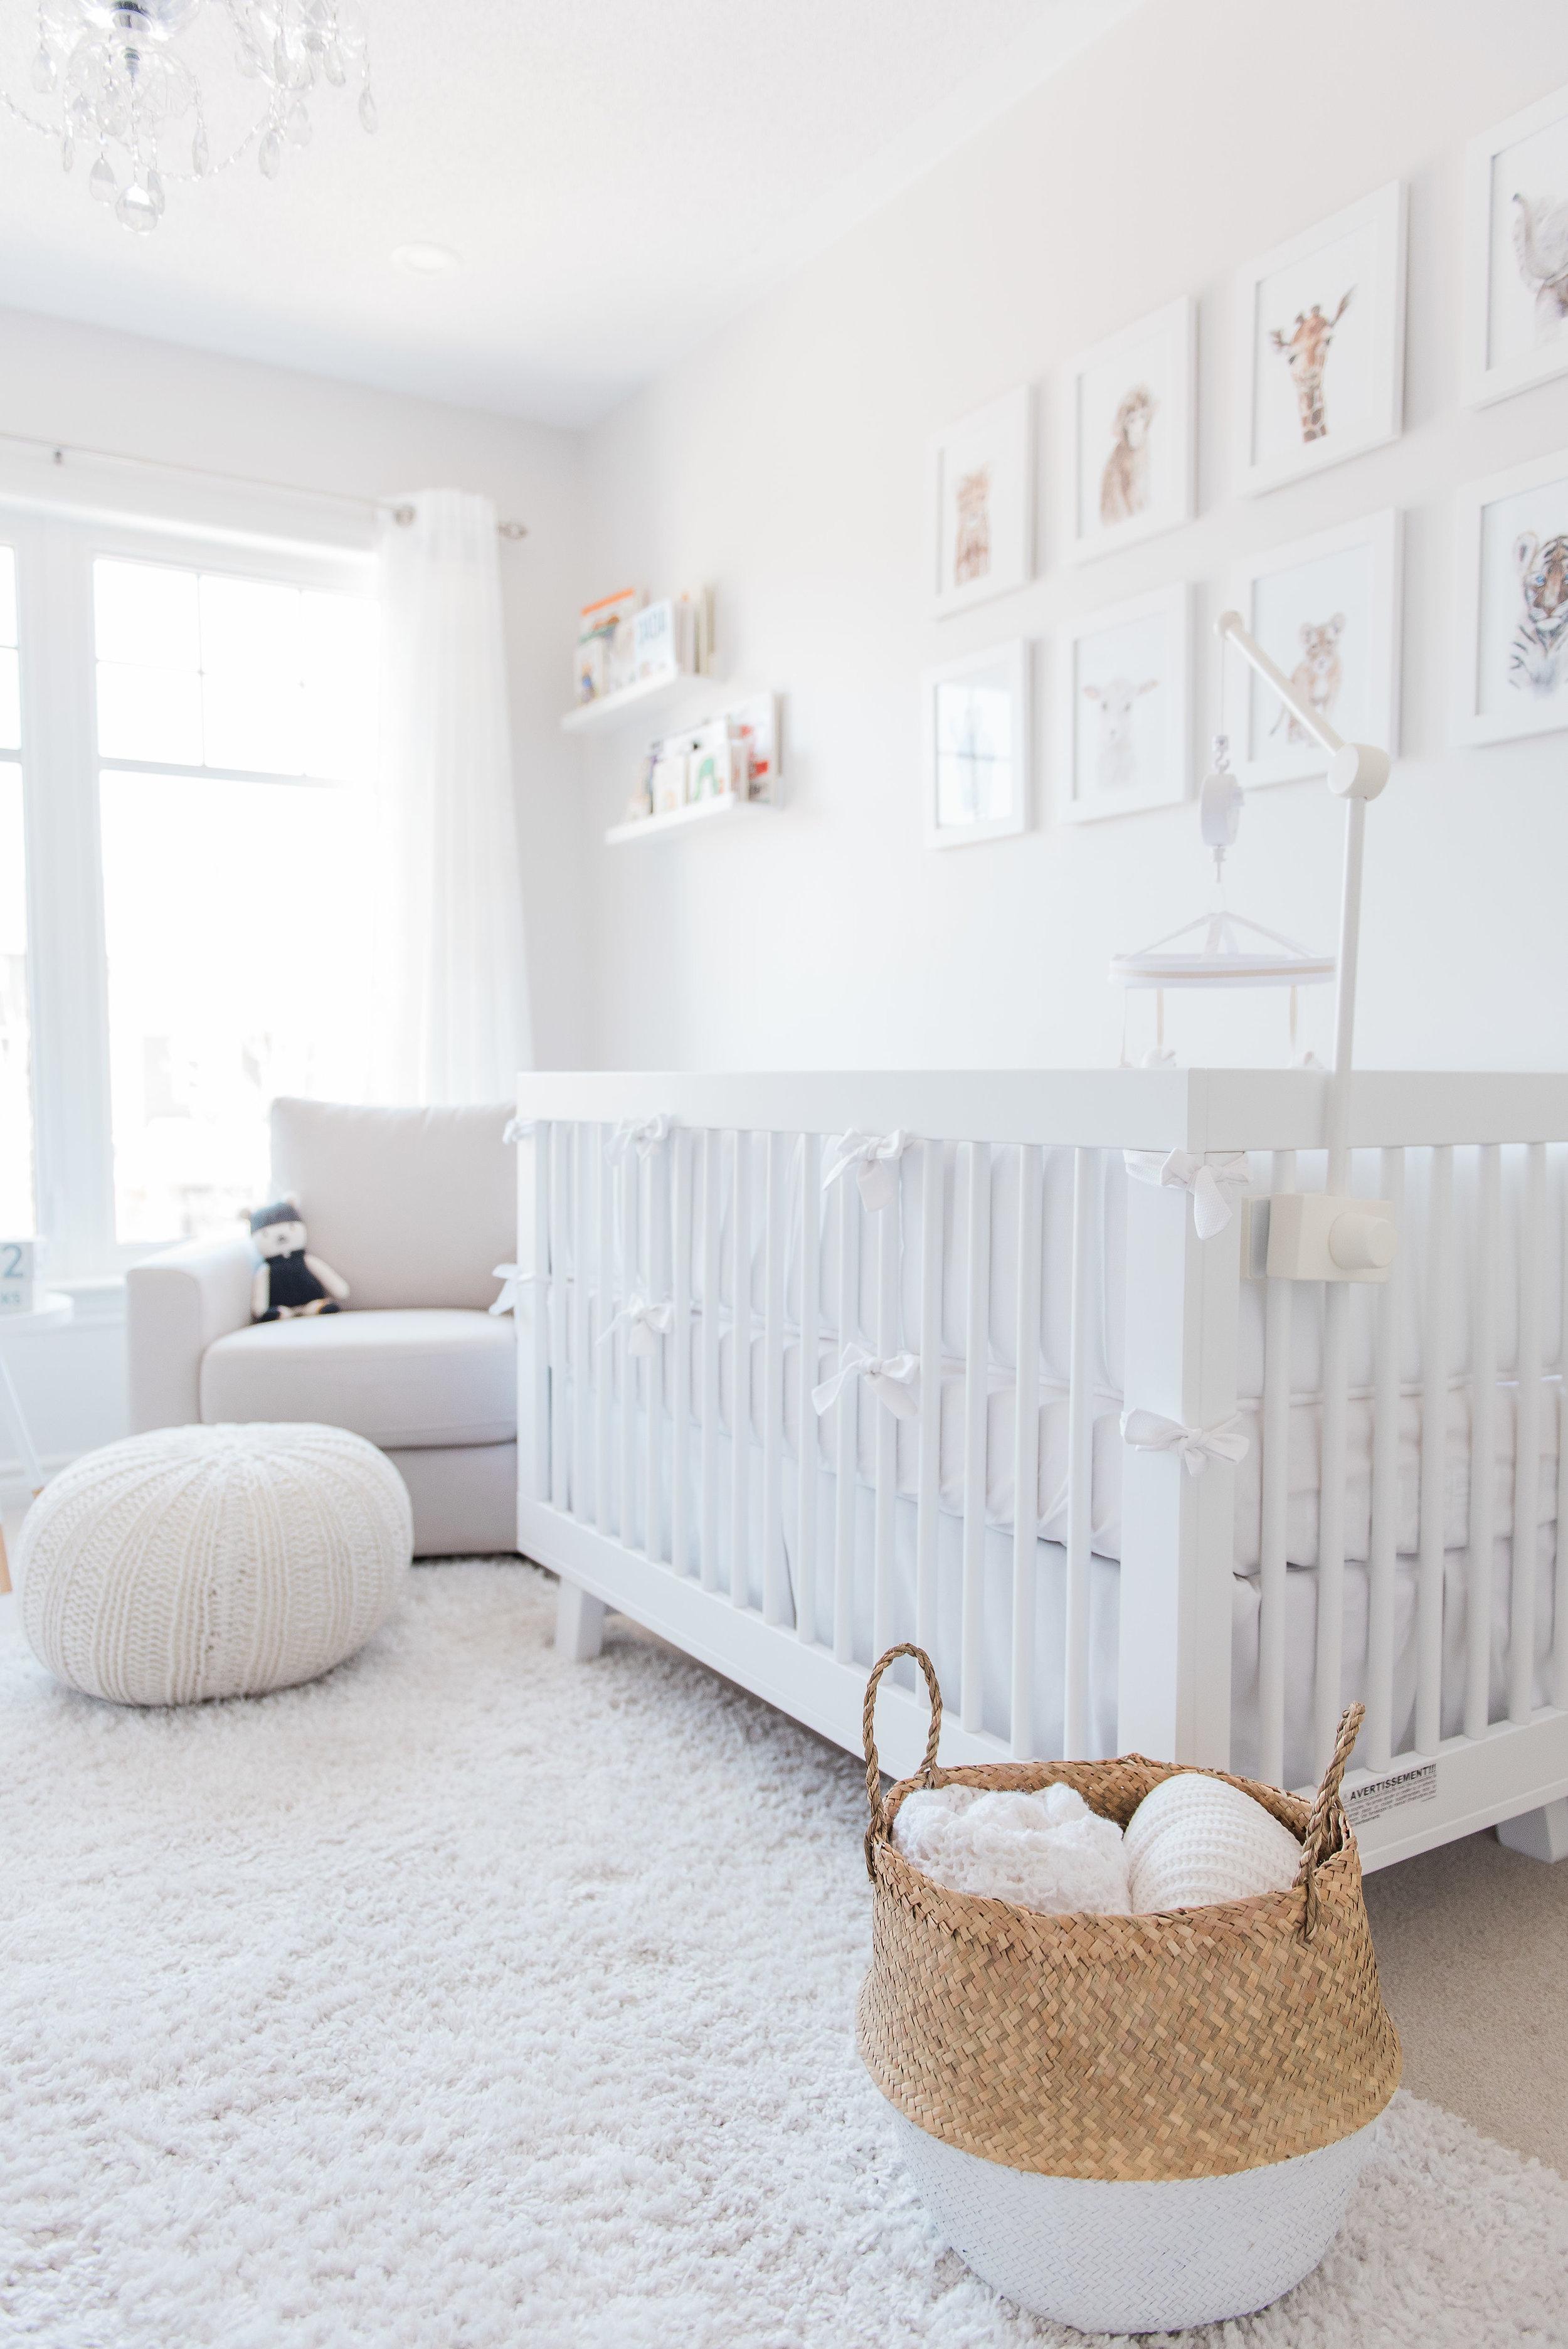 0031_Newborn_Lifestyle___All_White_Nursery_Baby_Boy___Hanan.jpg